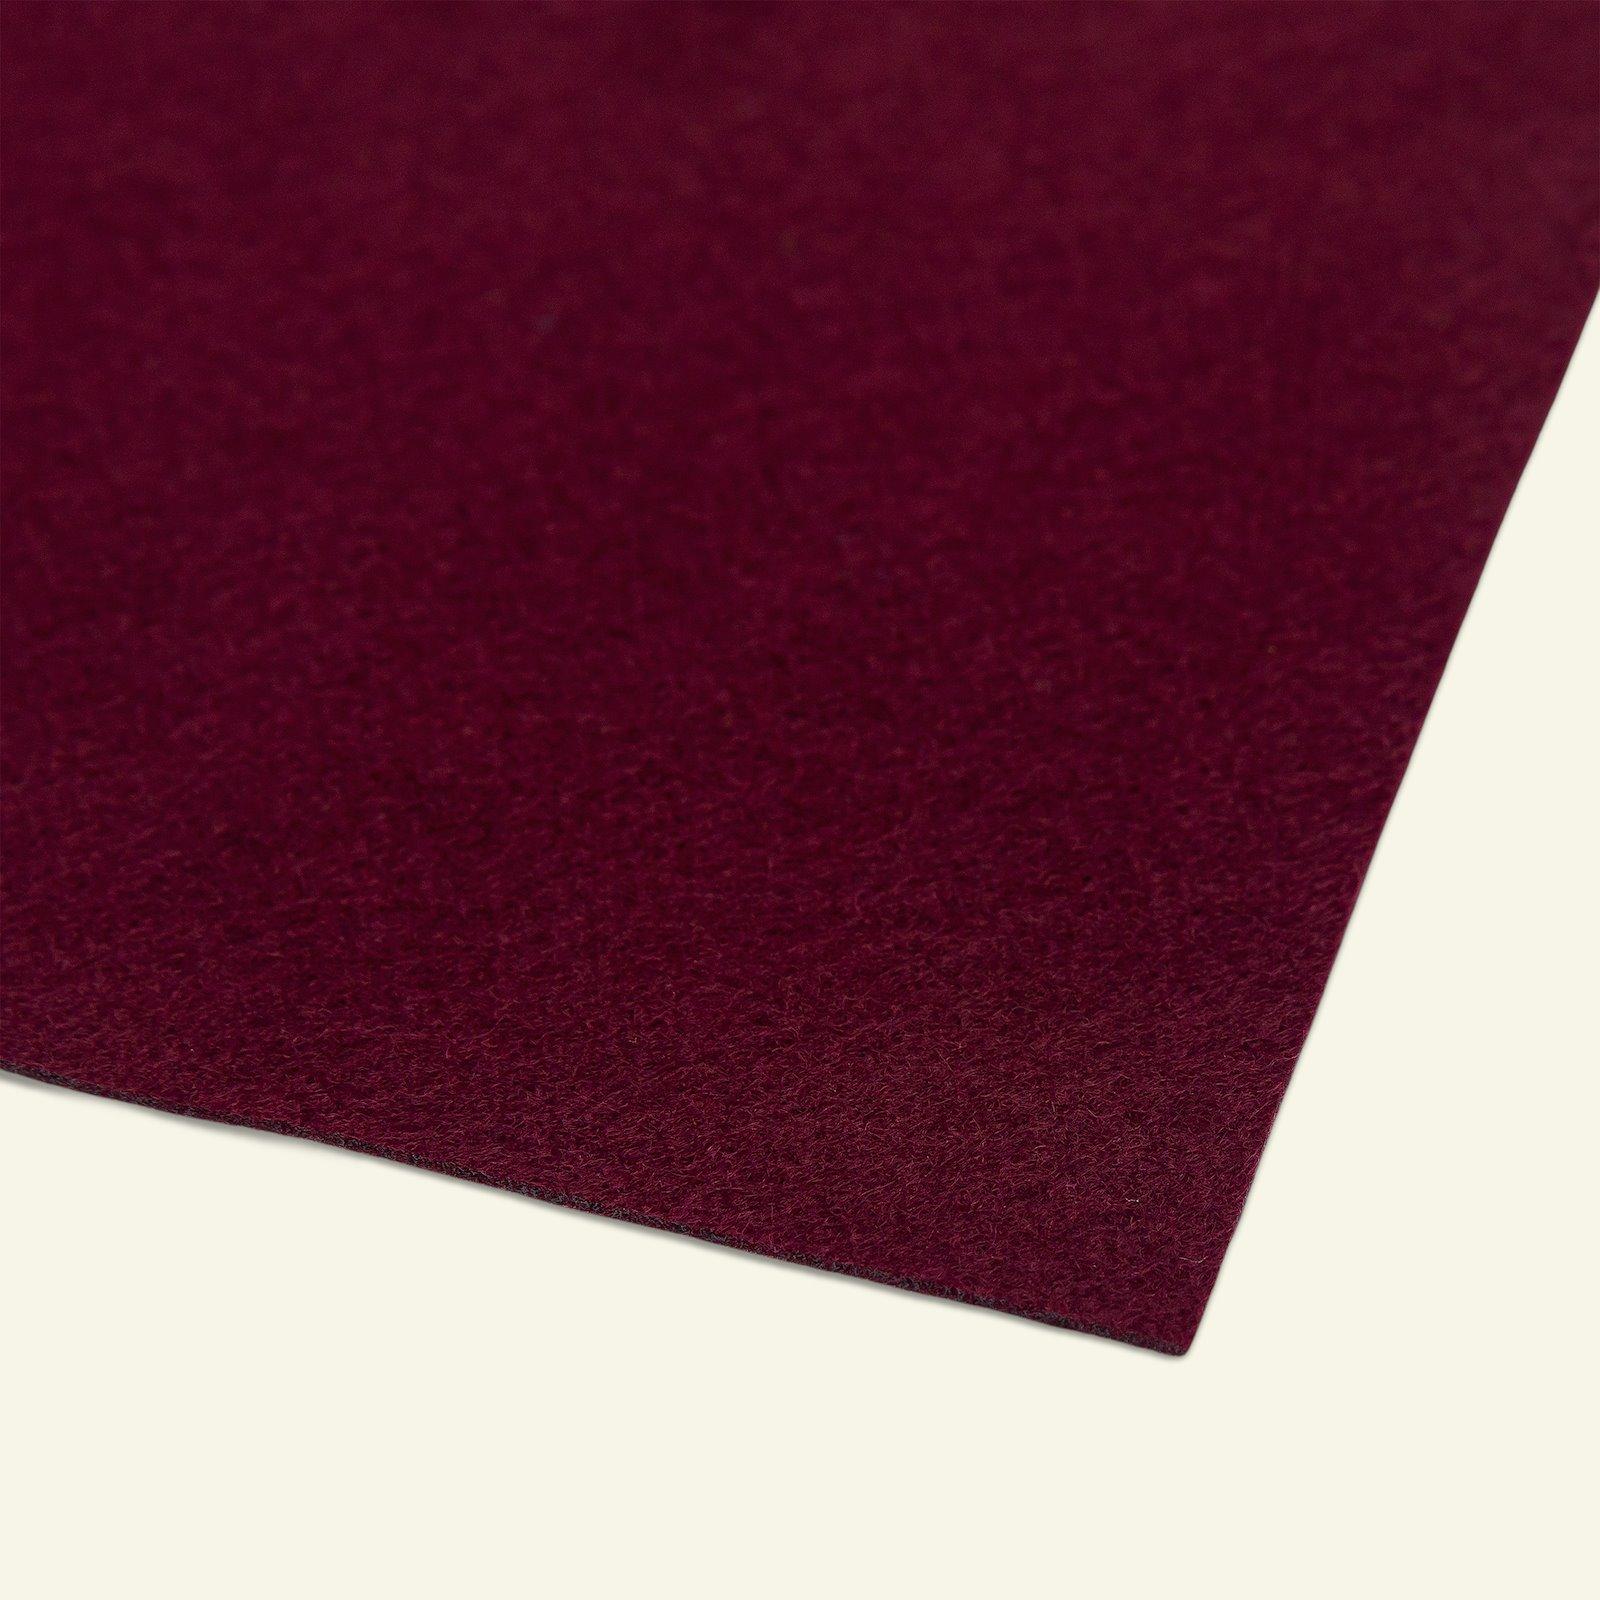 Felt 1,3mm 19,5x30cm dark colours 8 pcs 93704_pack_b